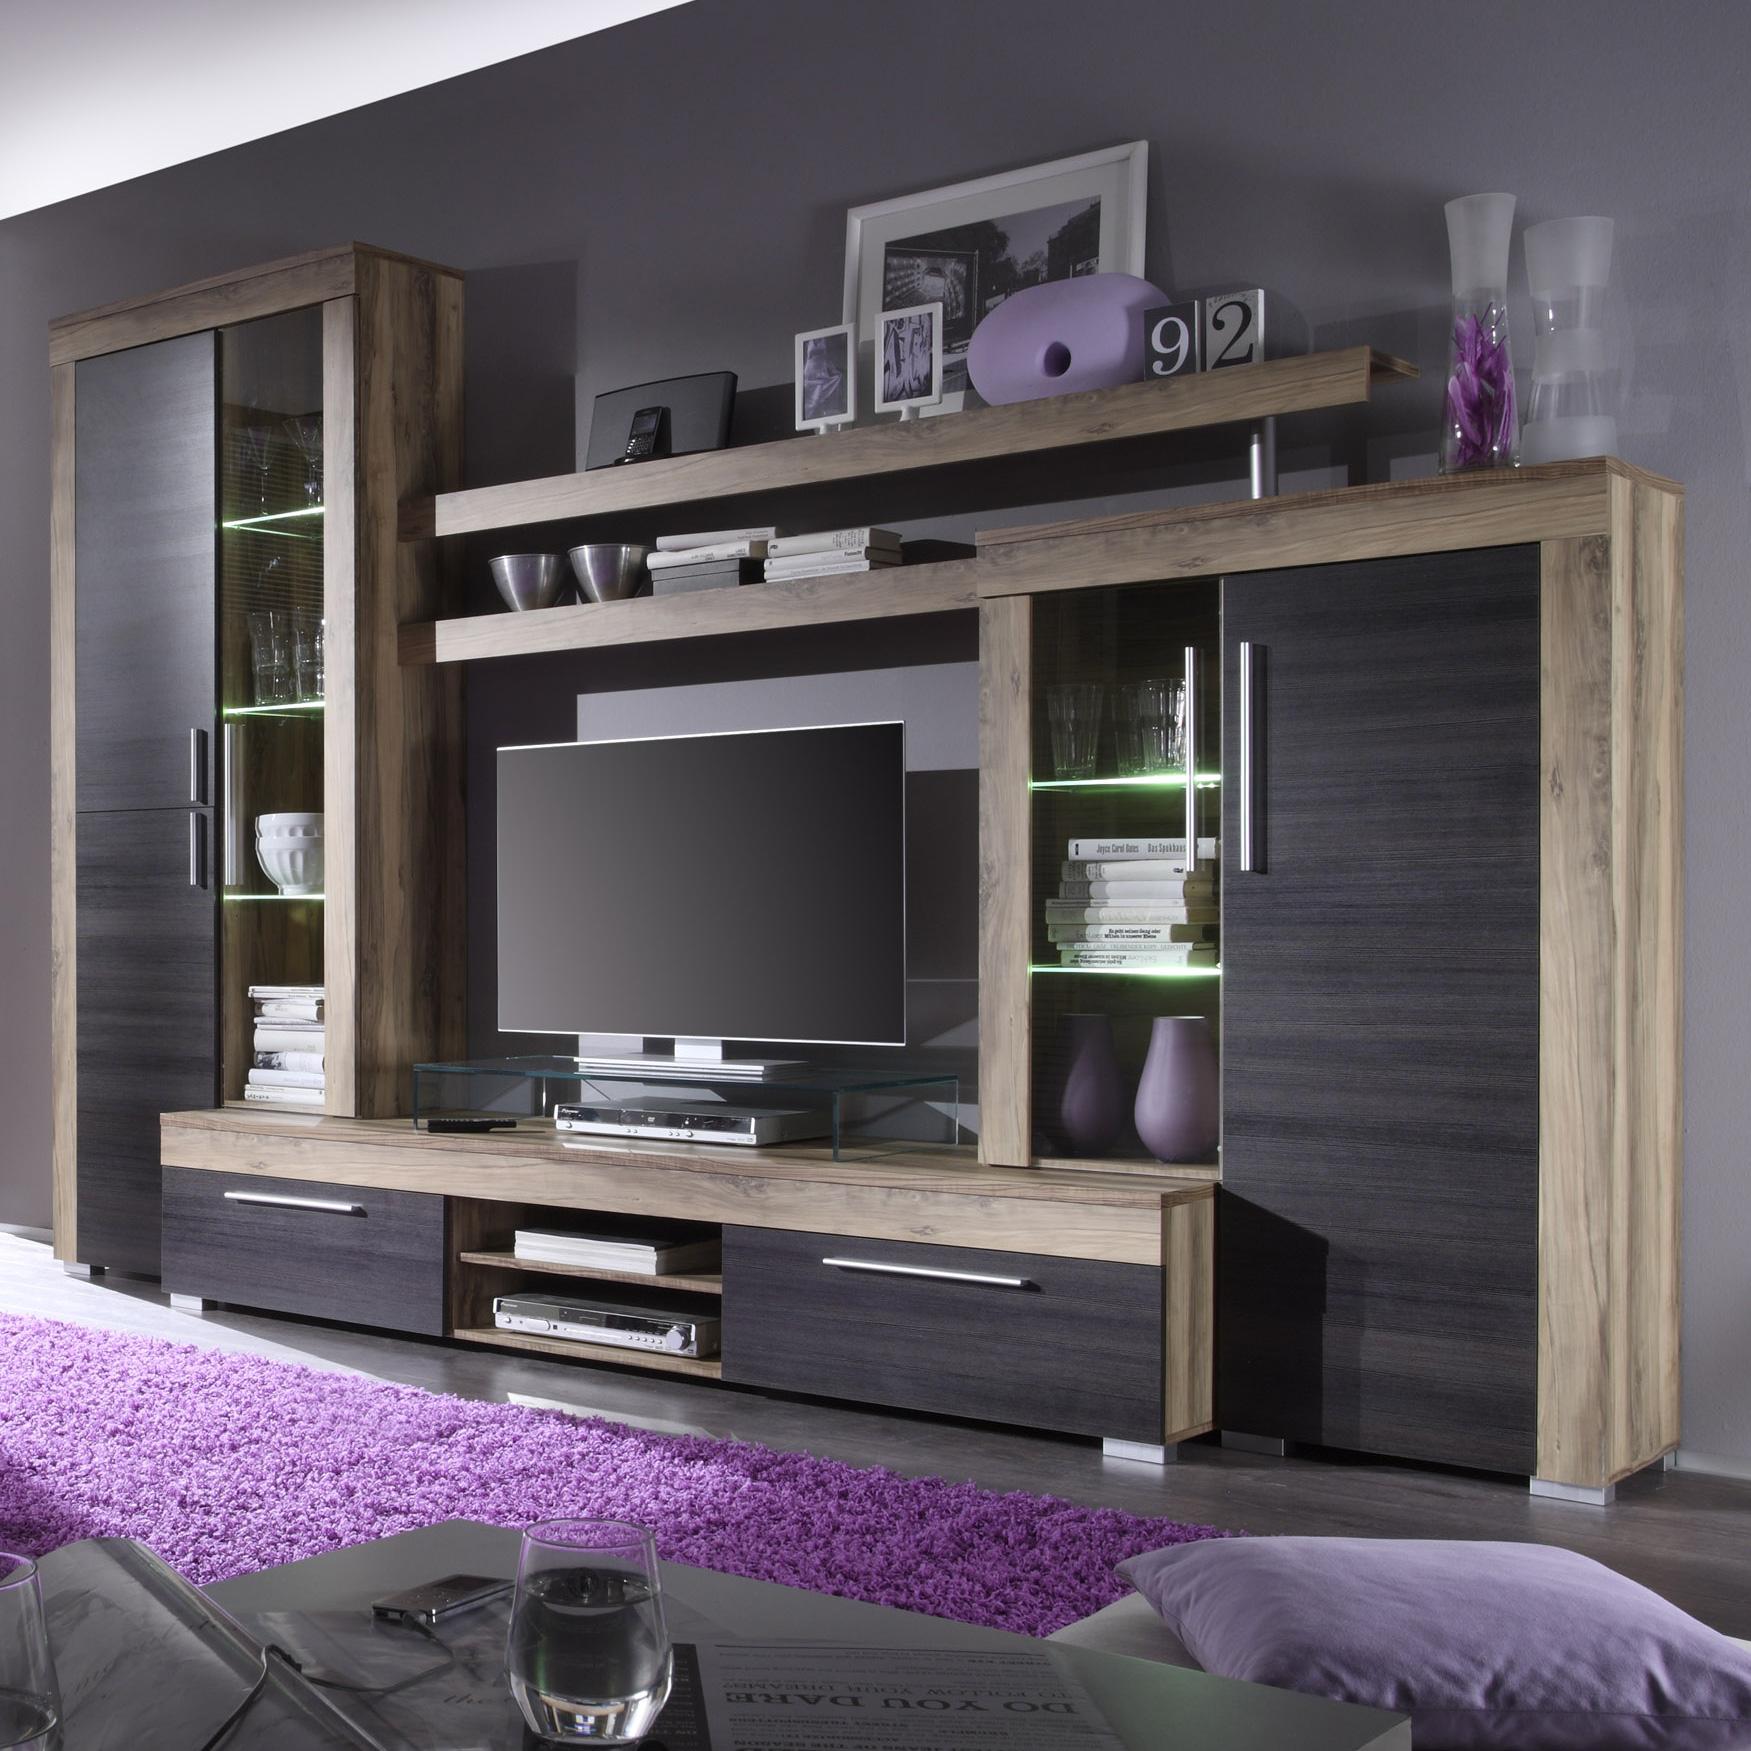 wohnwand boom anbauwand in nussbaum satin braun touchwood inkl beleuchtung ebay. Black Bedroom Furniture Sets. Home Design Ideas